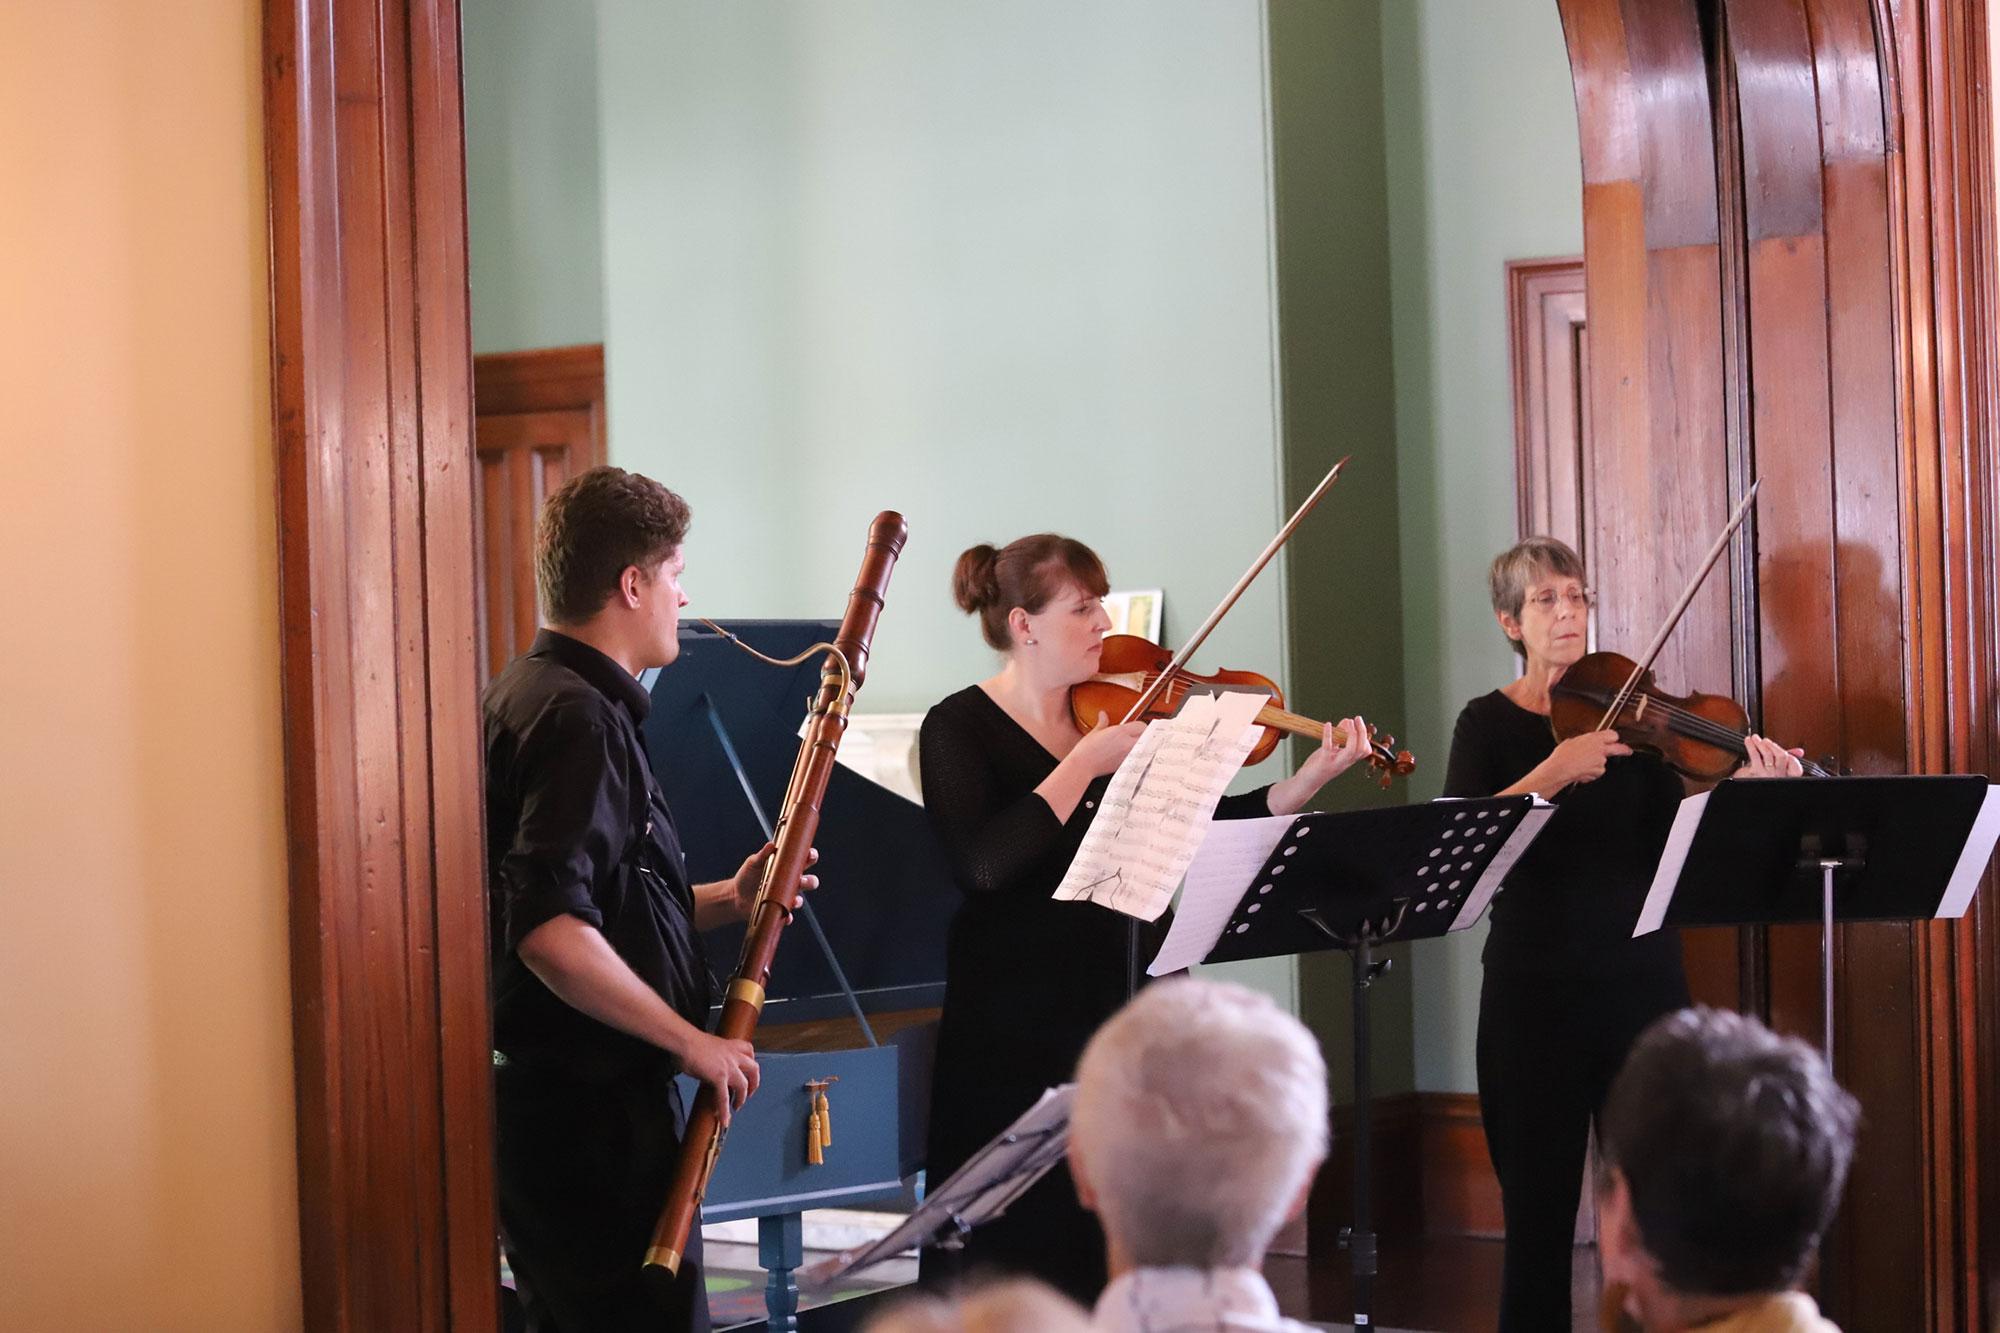 Brisbane baroque players